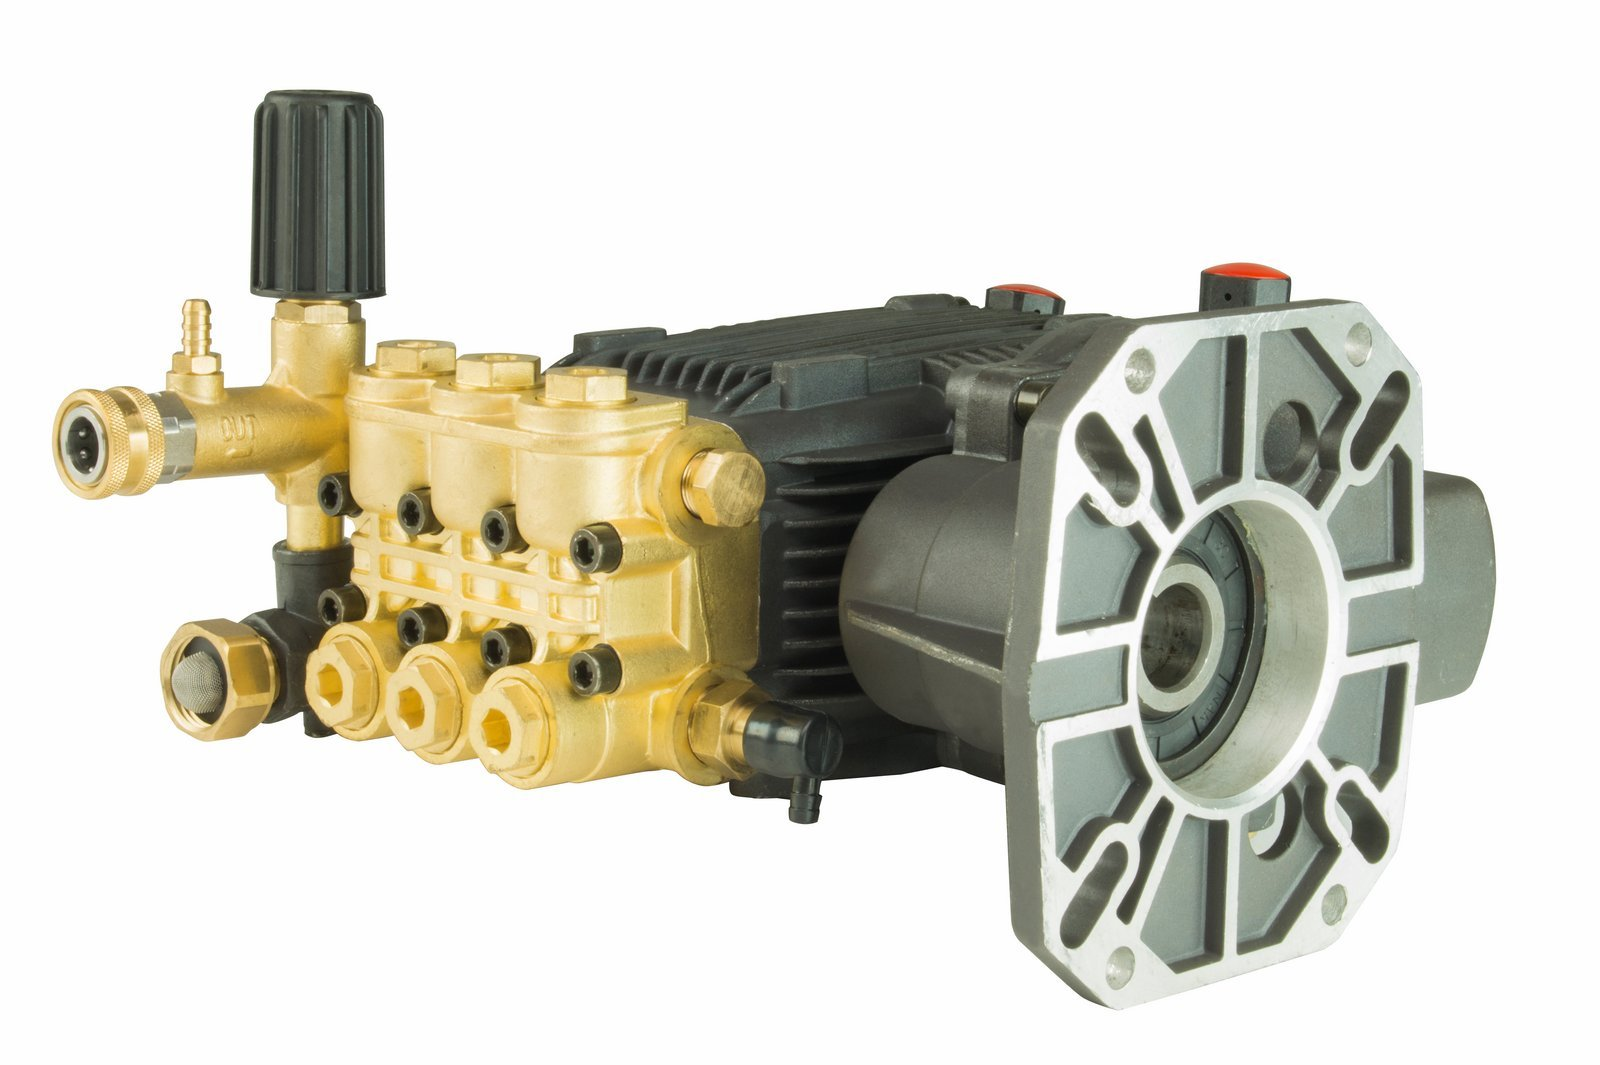 Erie Tools 4.4 GPM 3600 PSI Triplex High Pressure Washer Pump & Gearbox - 1'' Hollow Shaft